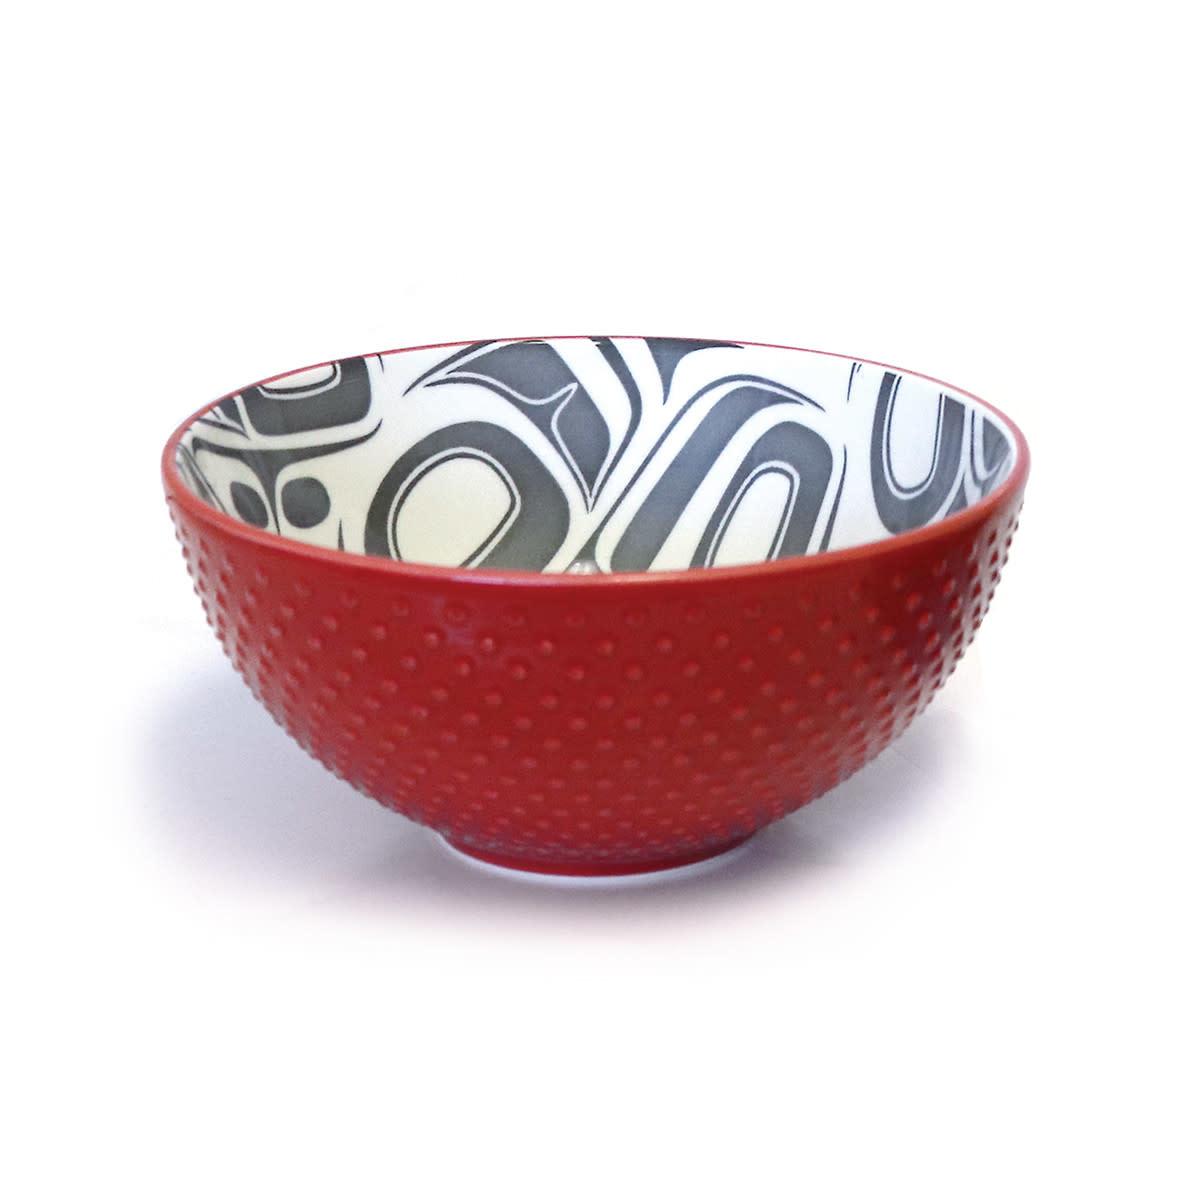 Porcelain Art Bowl - Medium-1